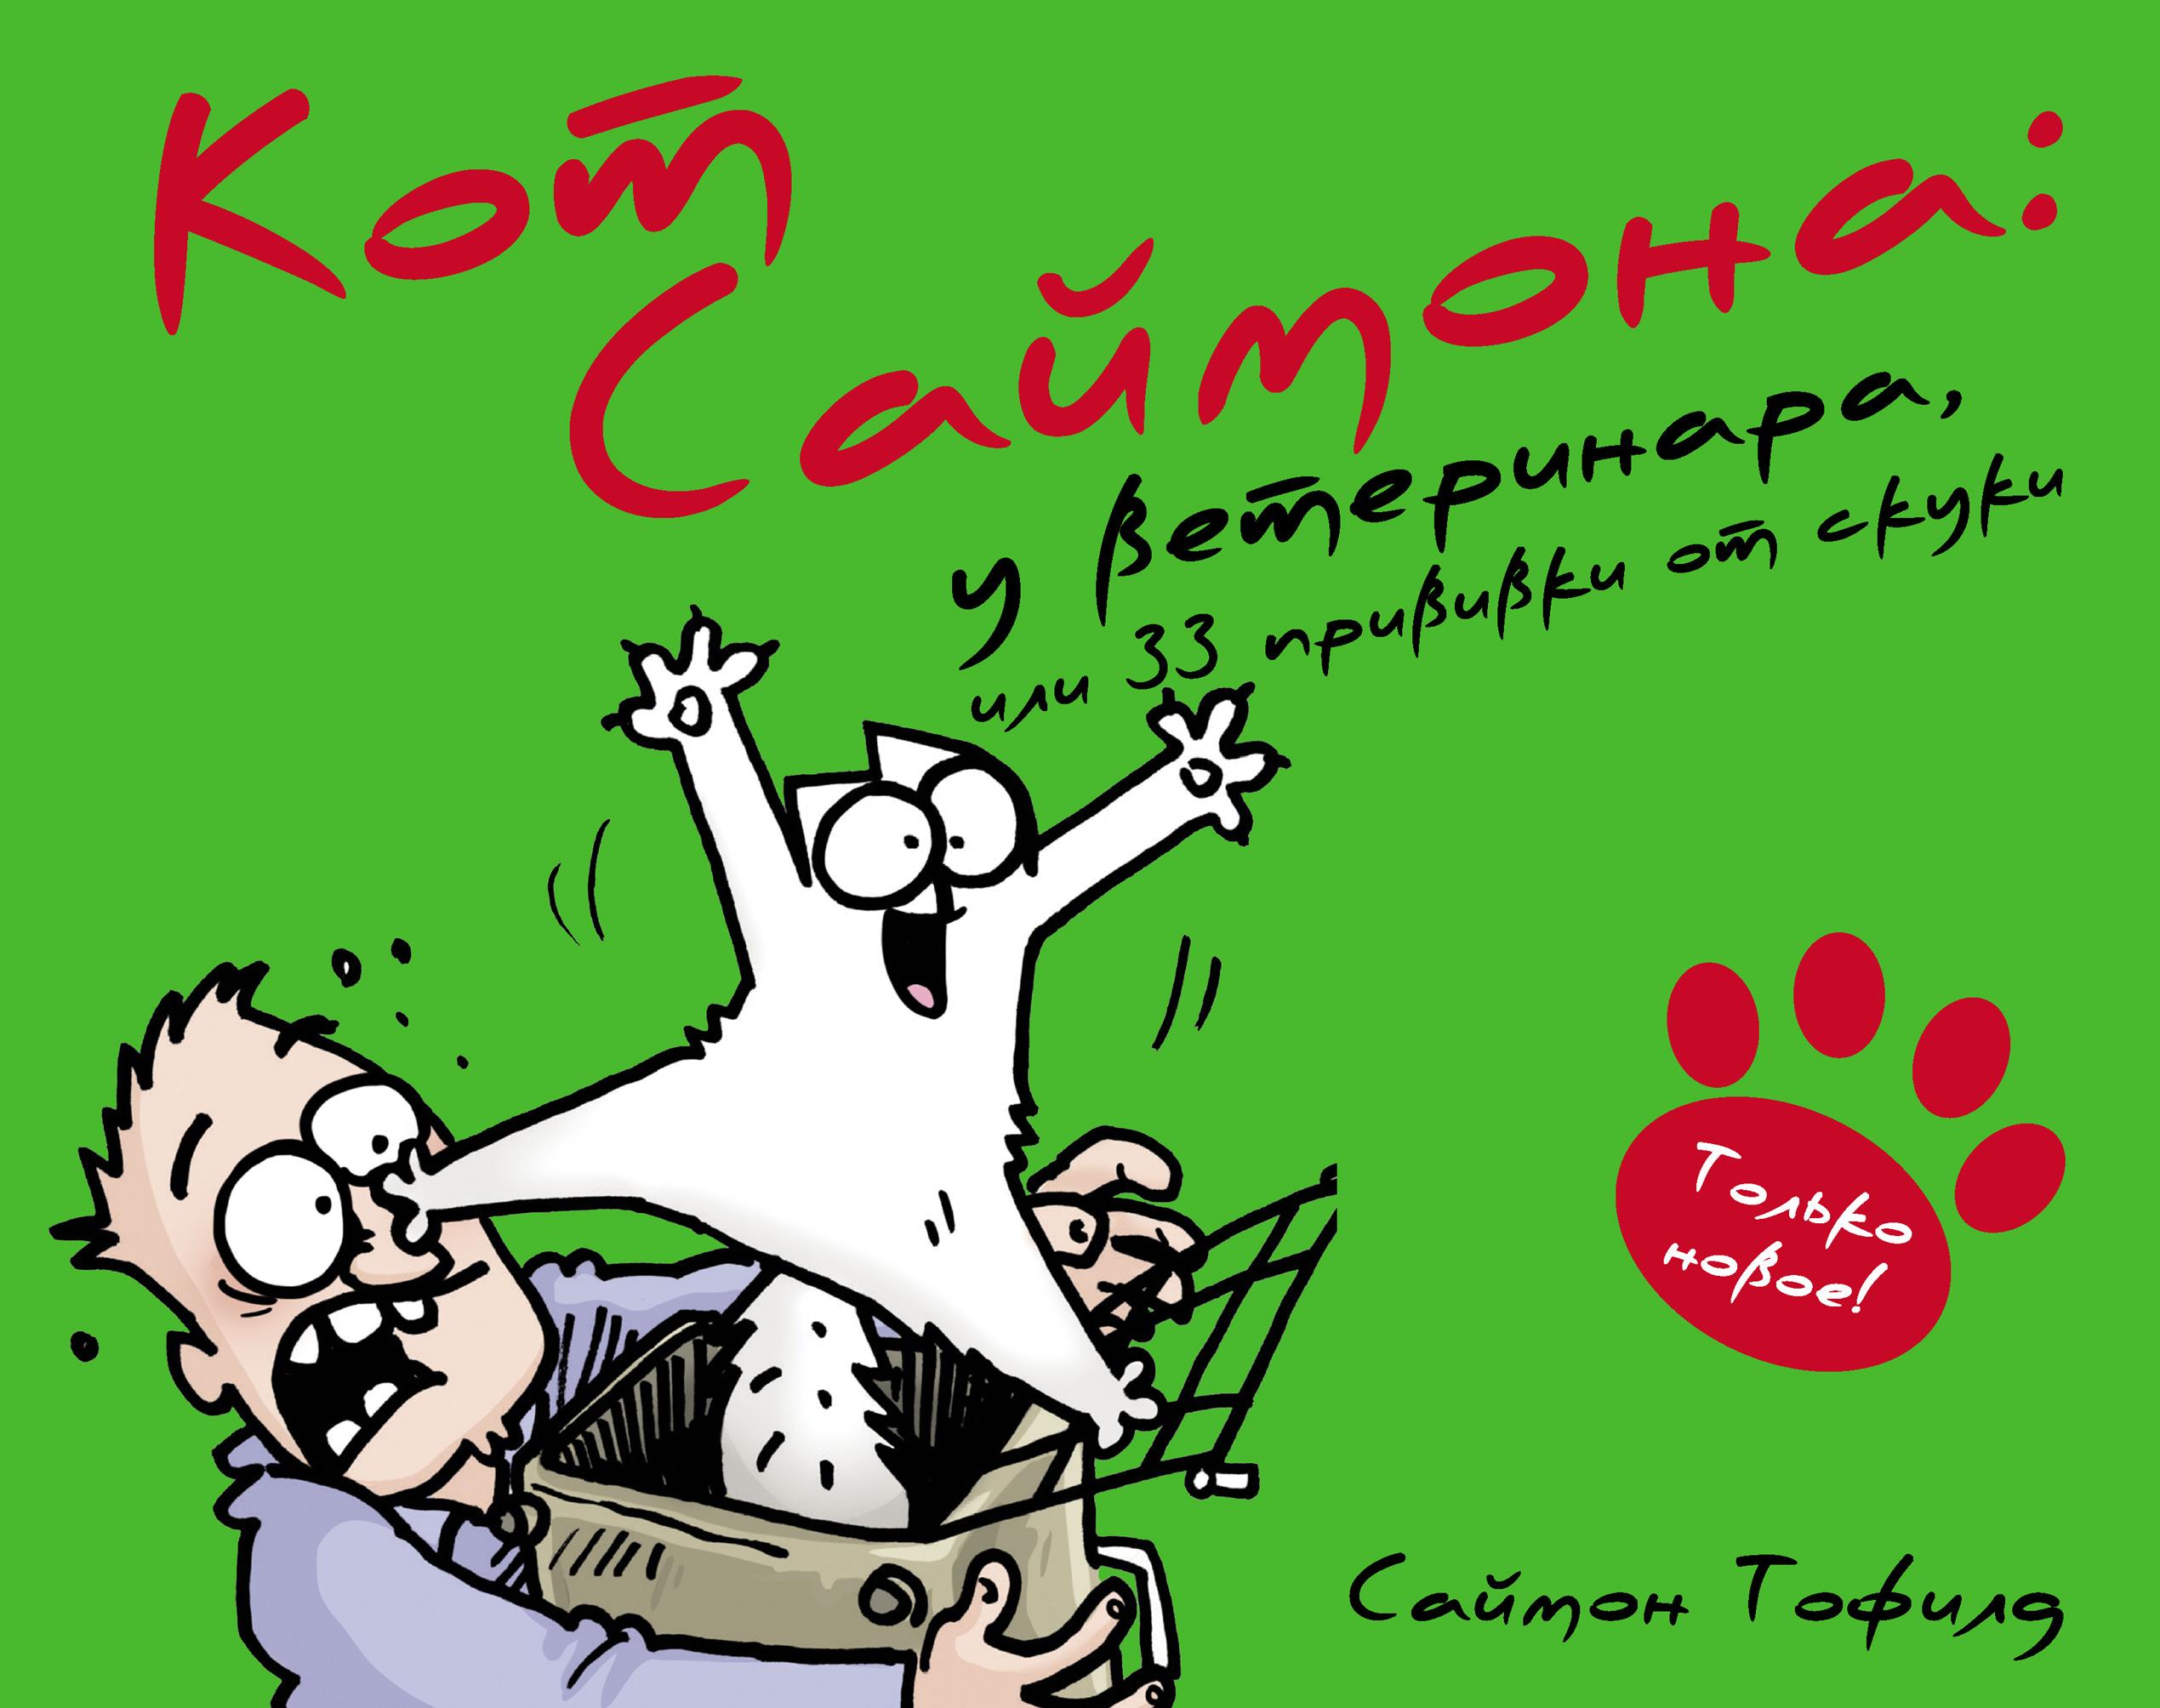 Саймон Тофилд Кот Саймона. У ветеринара, или 33 прививки от скуки тофилд с кот саймона раскраска зеленая isbn 978 5 9909493 2 4